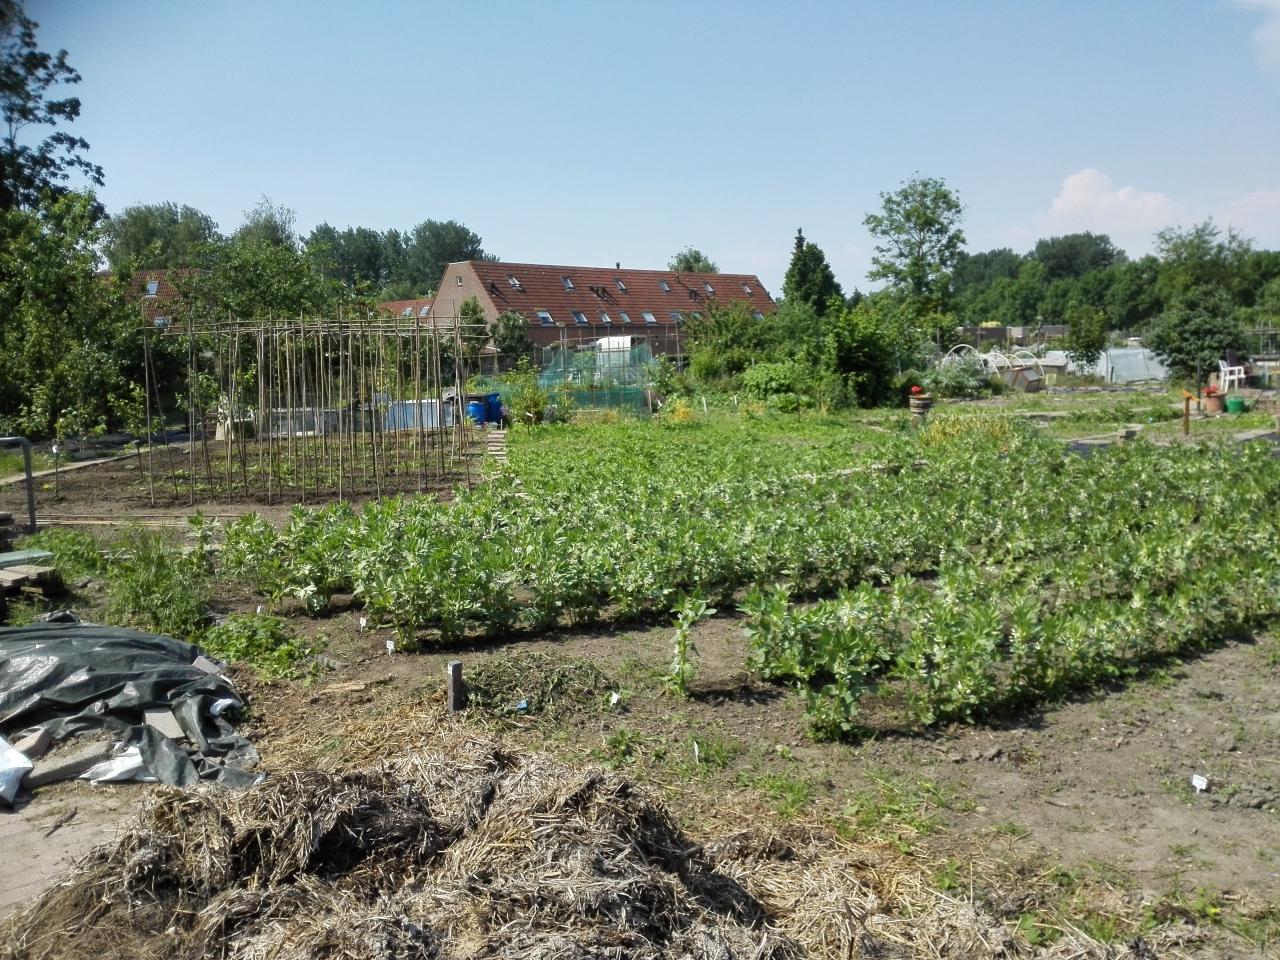 Goedkope Meubels Almere : Voedselloket almere vla voedseltuin